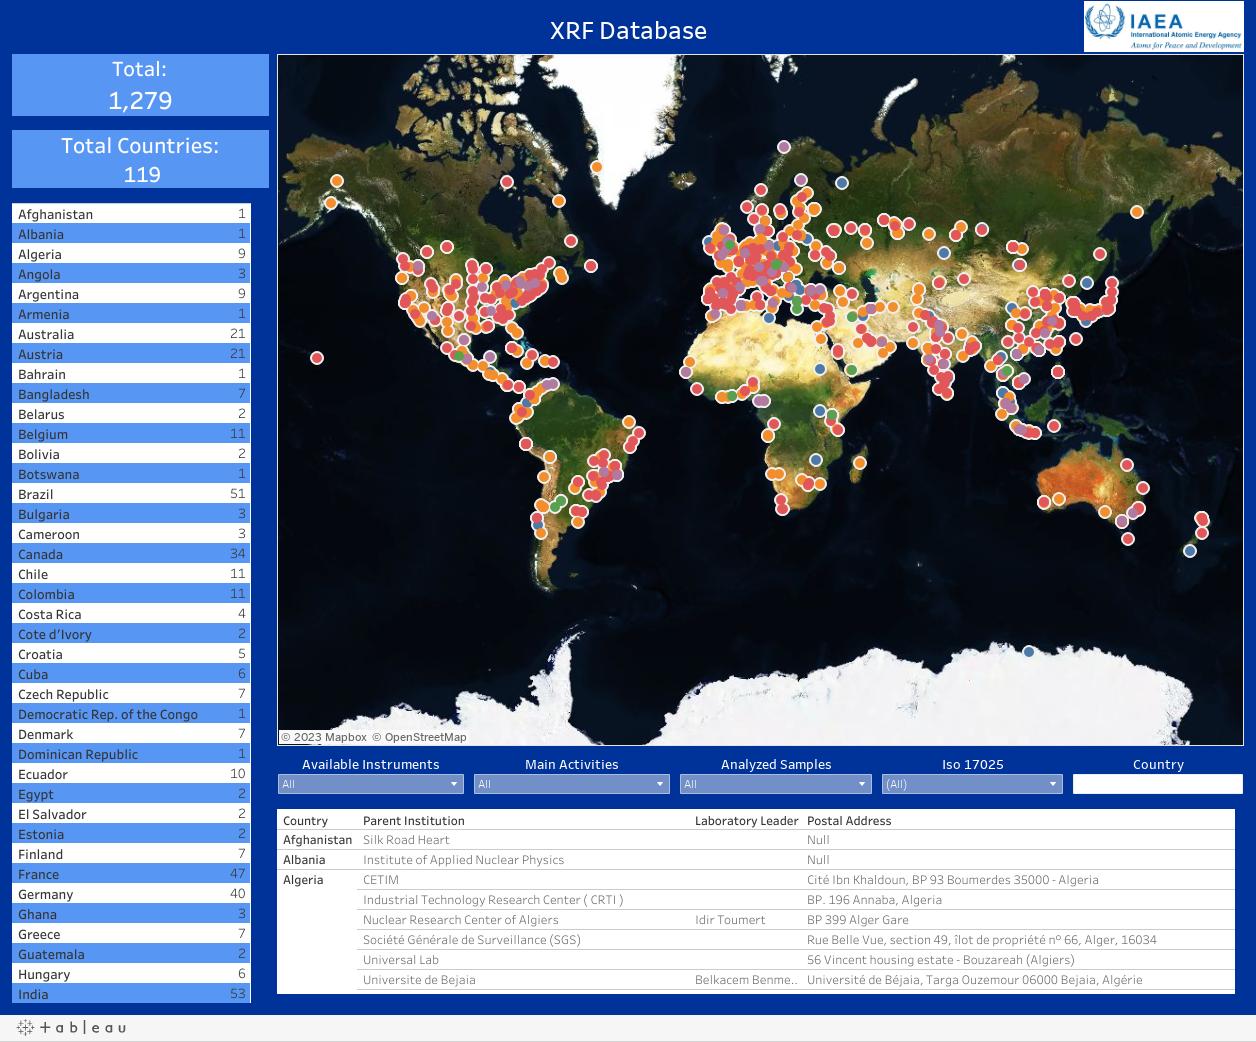 XRF Database